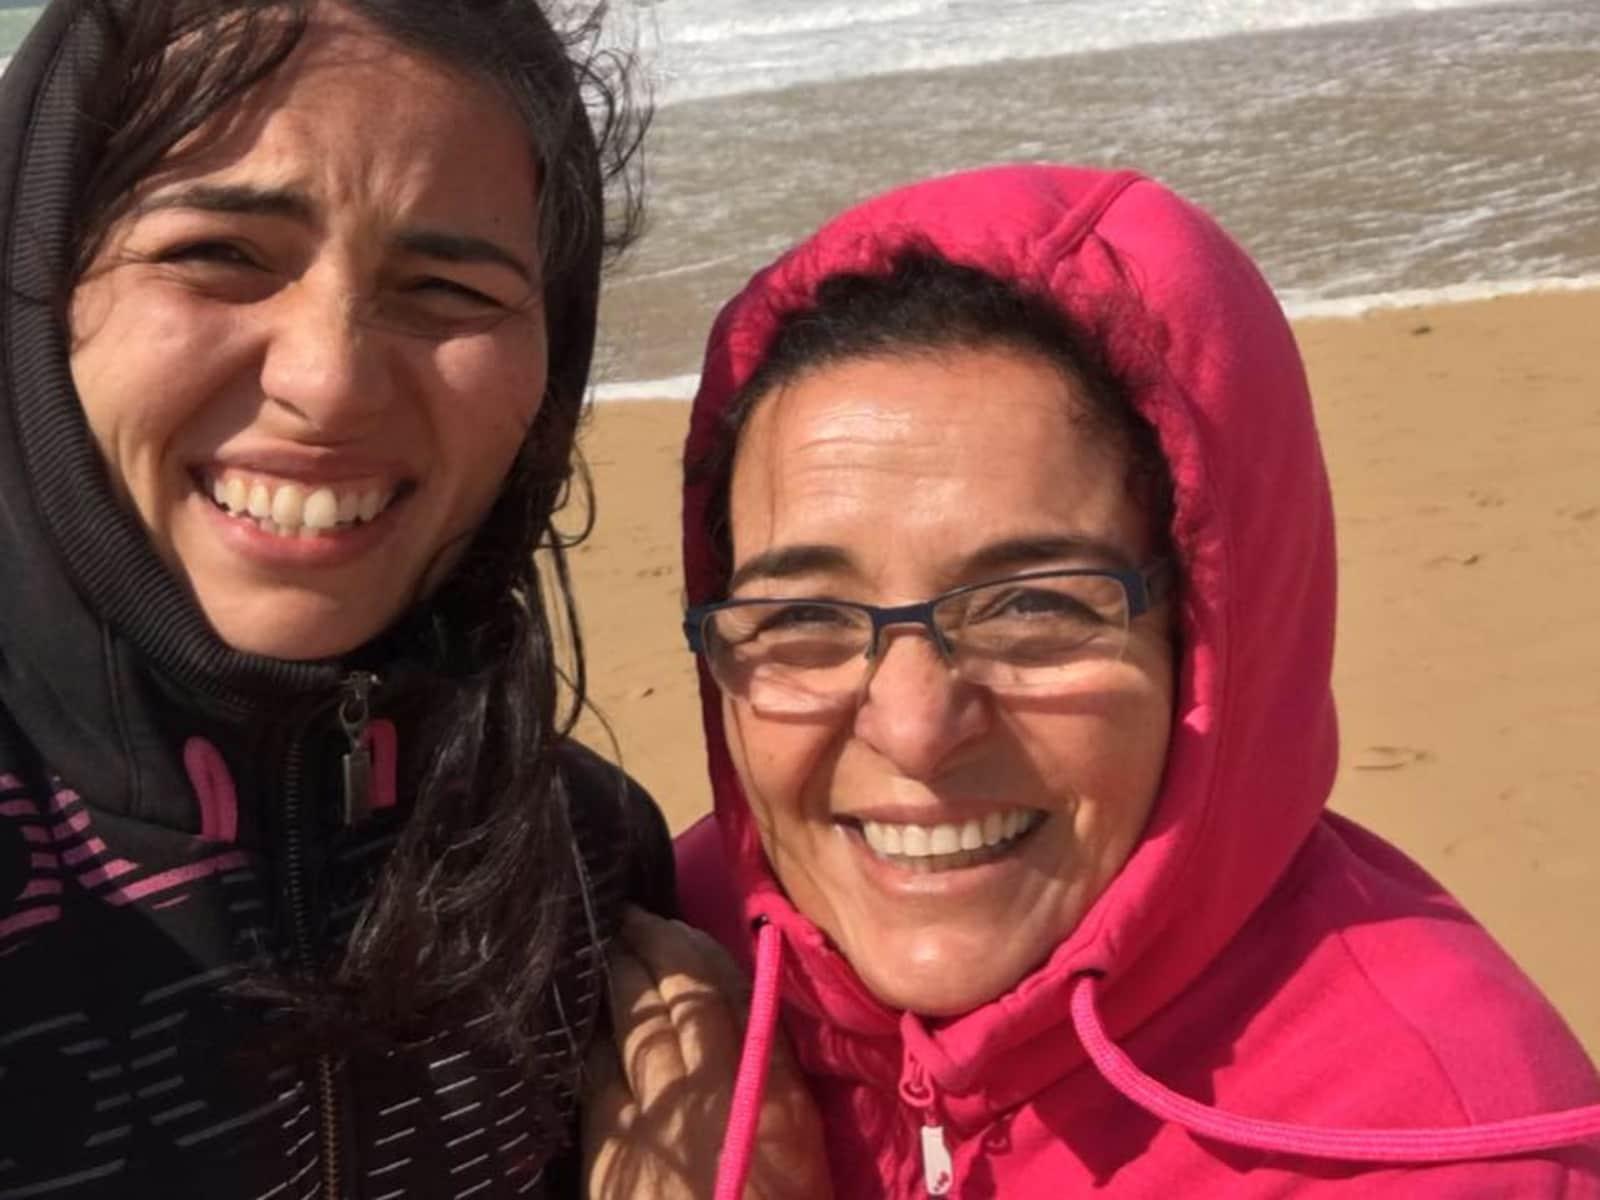 Maria rocio from Ras al-Khaimah, United Arab Emirates